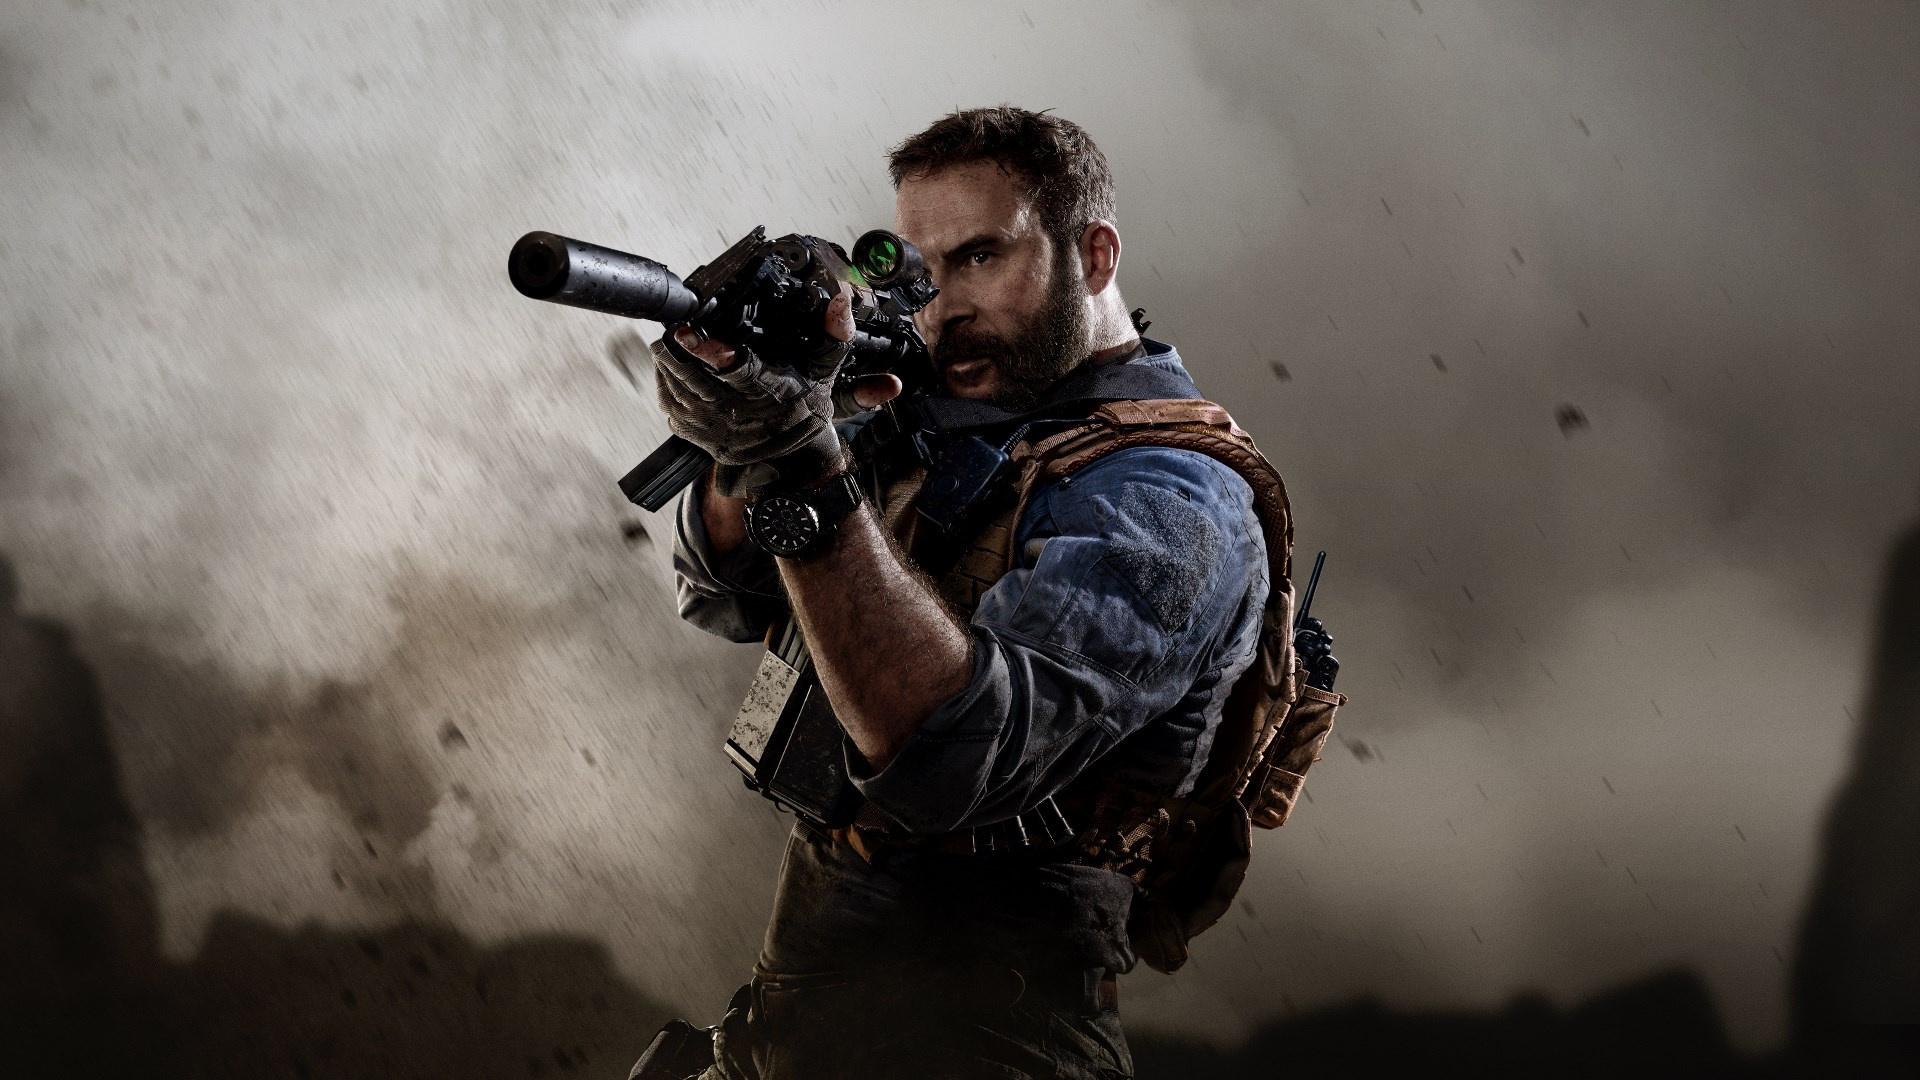 Warzone нельзя удалить из PC-версии Call of Duty: Modern Warfare даже после патча